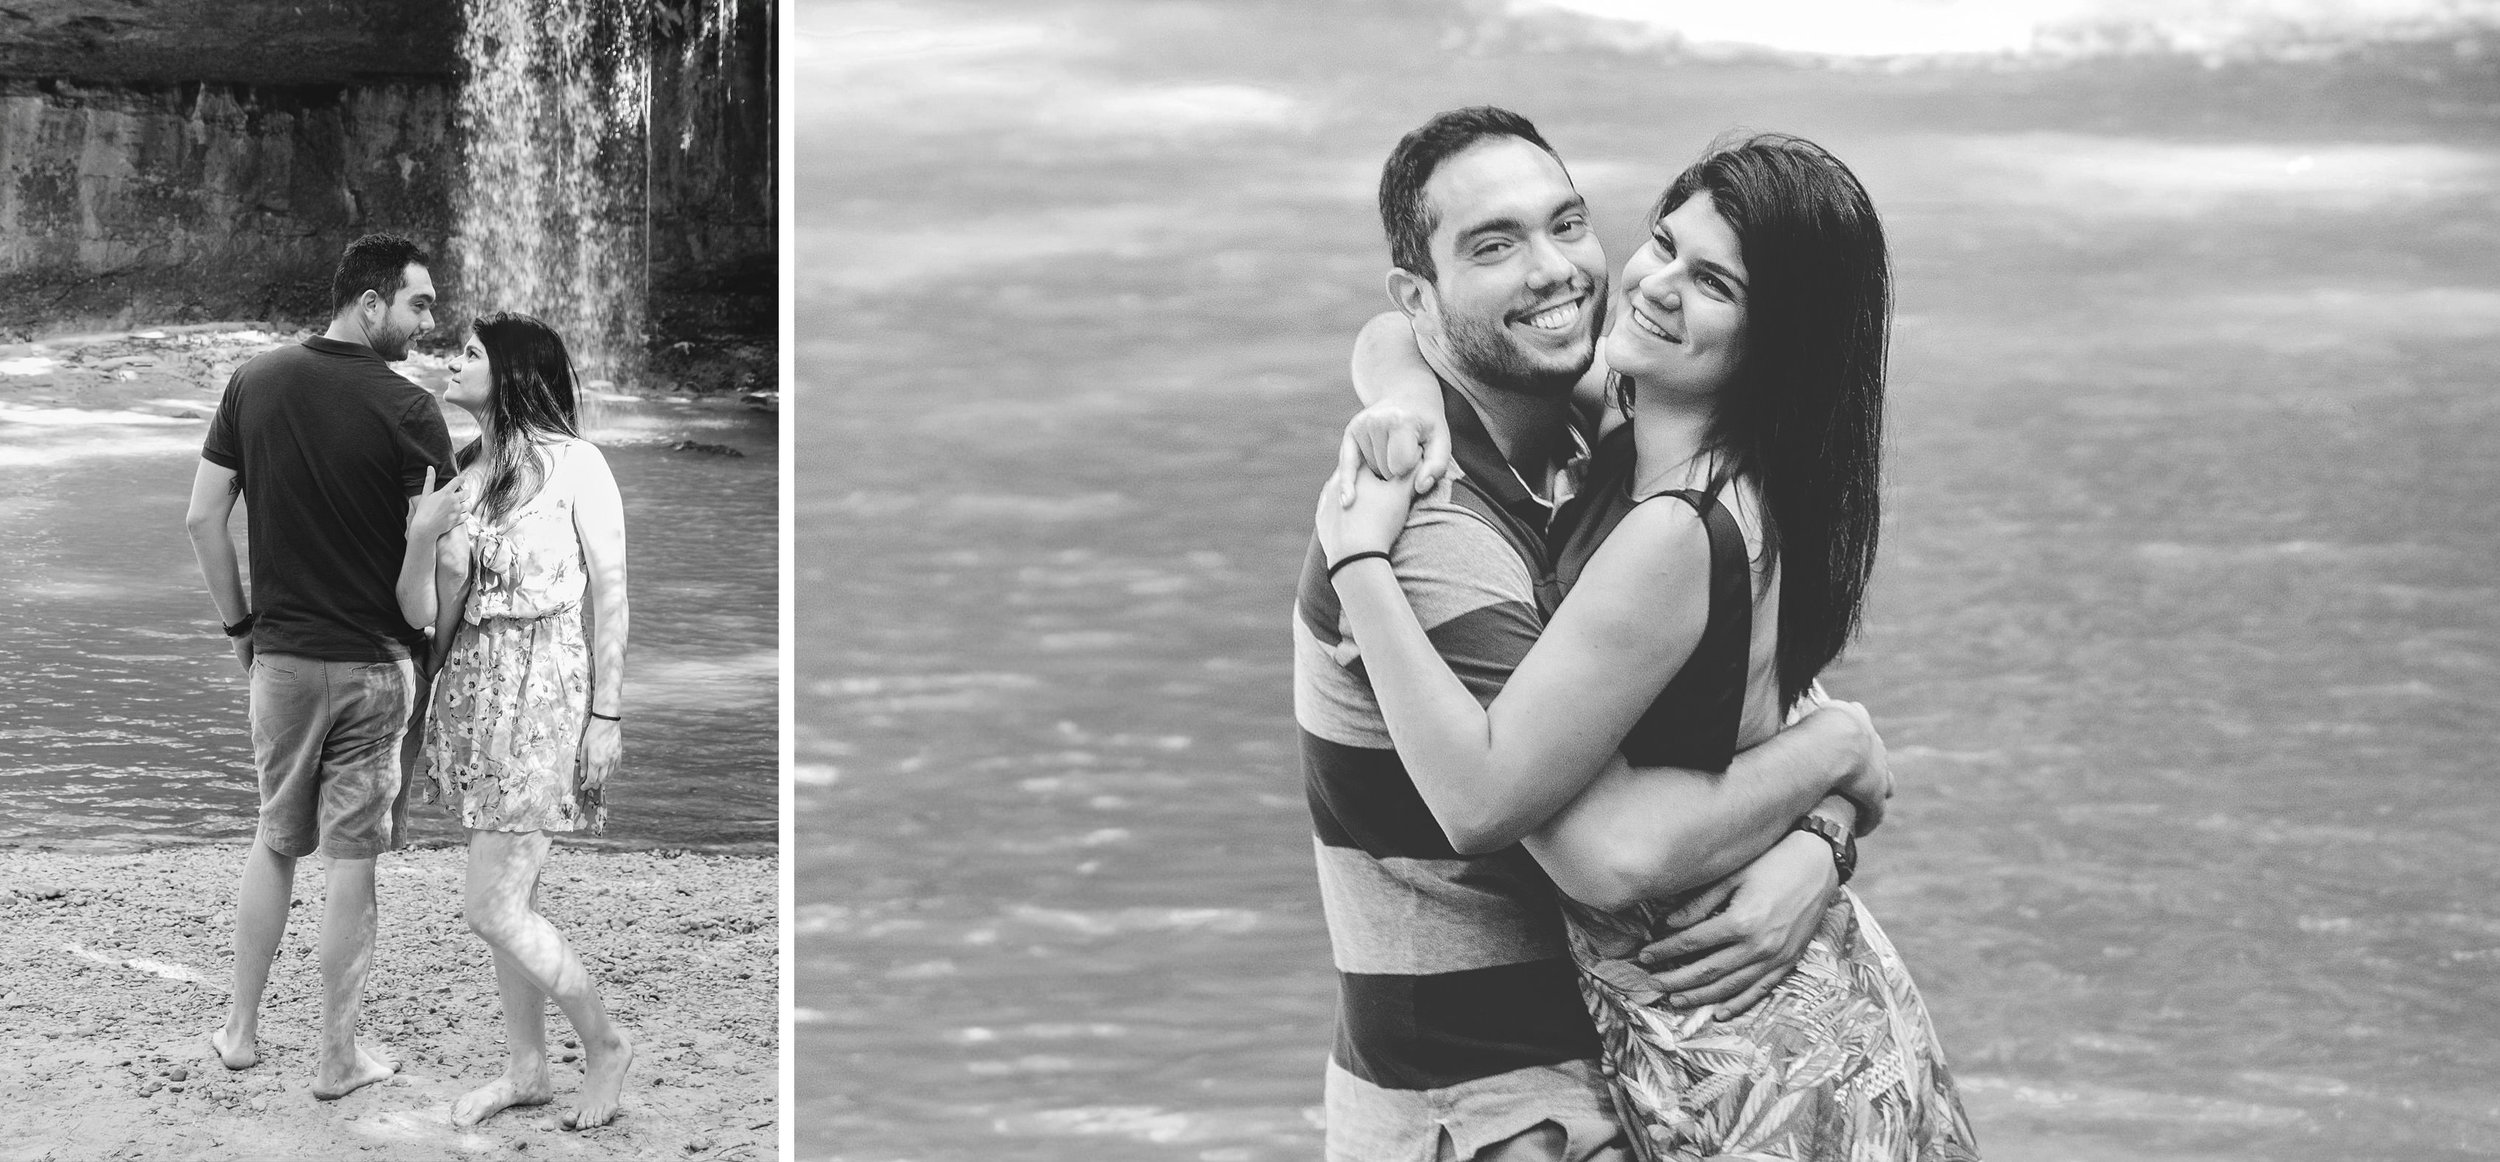 Destination wedding adventure photographer Iceland Hawaii Brazil waterfall David and Gabriela (5).jpg